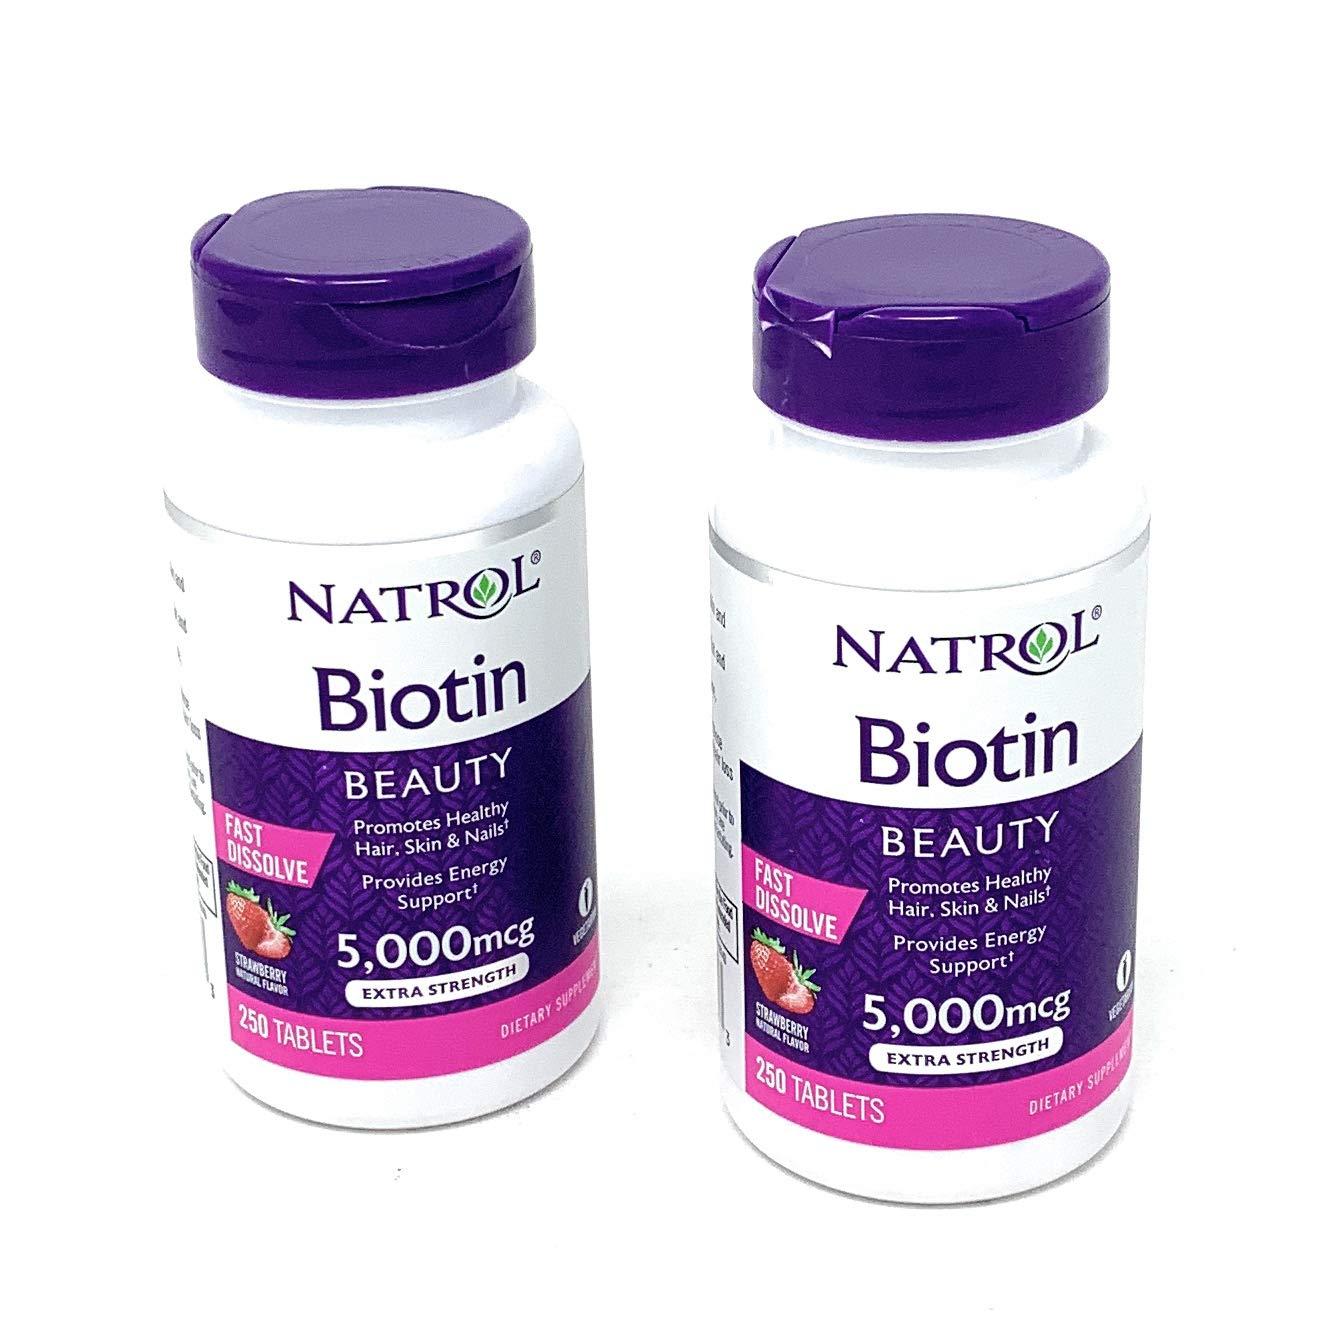 Natrol Biotin 5000 mcg Fast Dissolve Tablets (Strawberry (2 Pack)) by Natrol